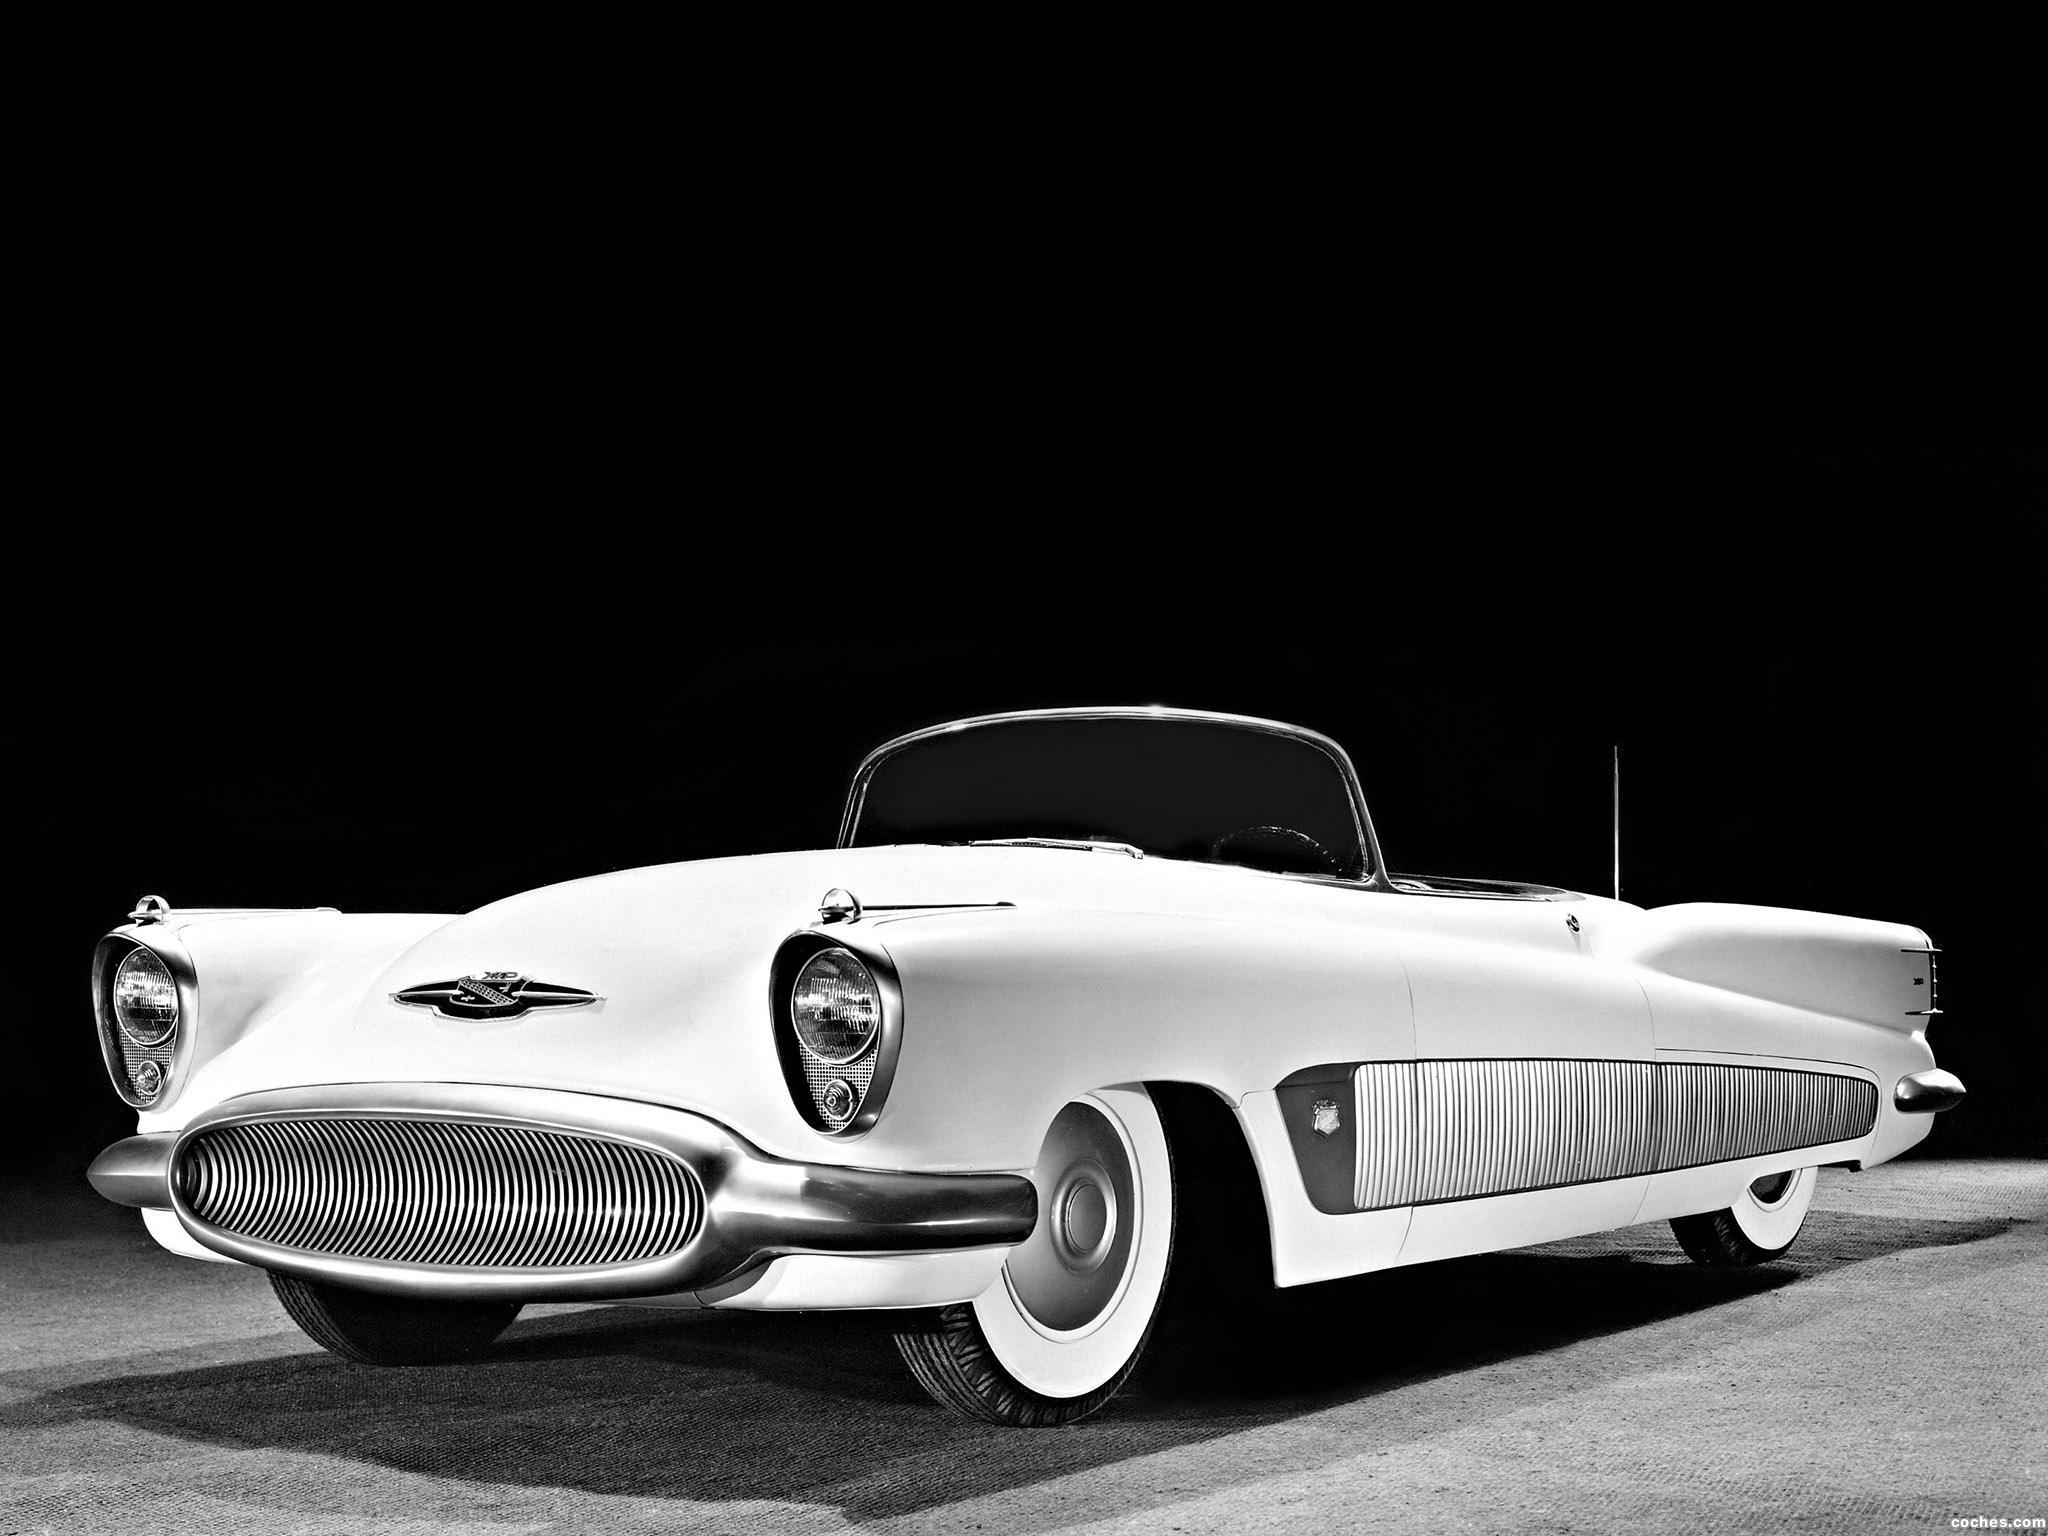 buick_xp-300-concept-car-1951_r3